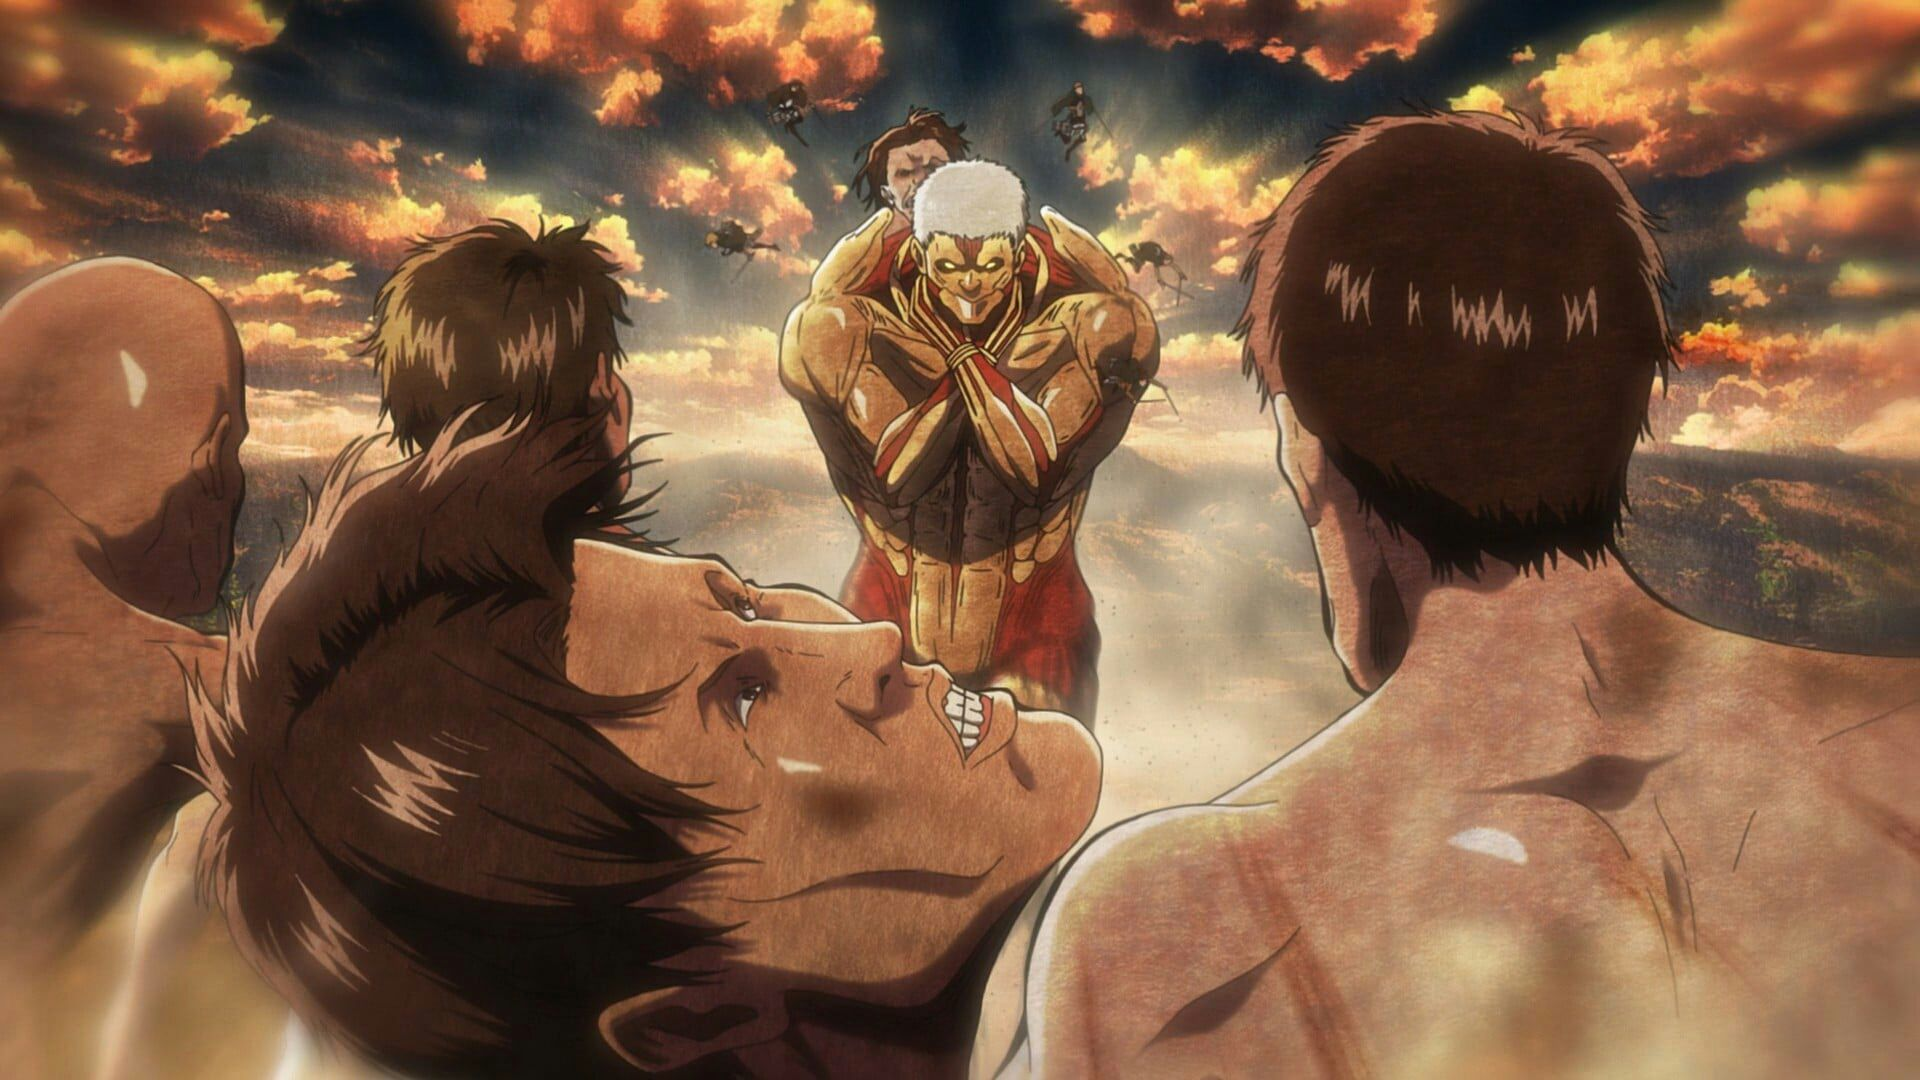 Download 52 Koleksi Wallpaper Bergerak Attack On Titan Paling Keren